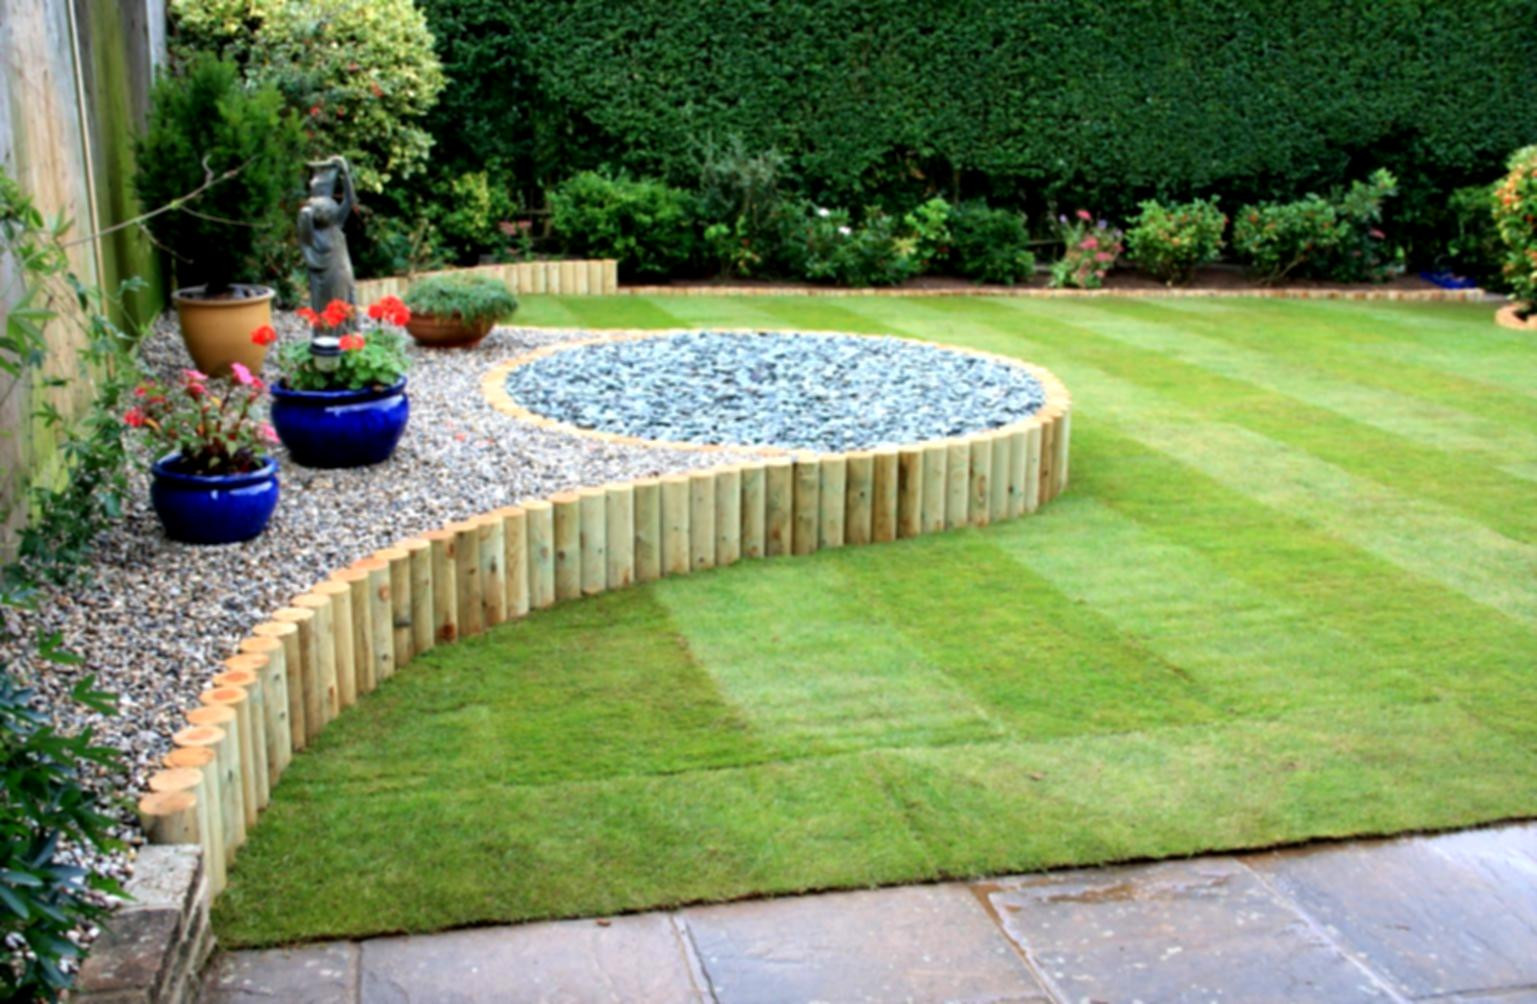 Best ideas about Diy Landscape Design . Save or Pin 20 Landscape Designs for Backyard Dap fice Now.